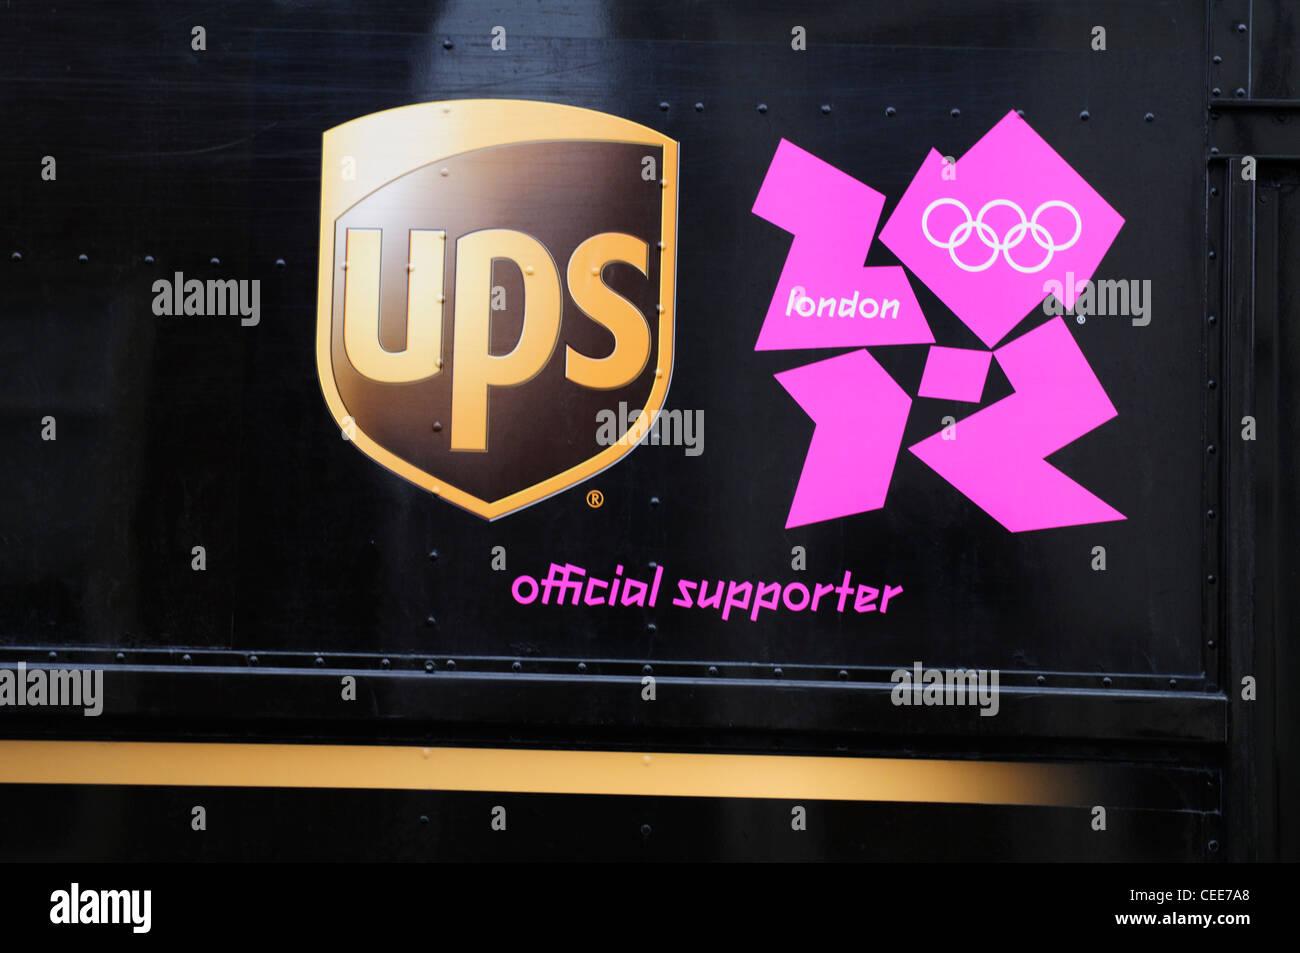 UPS Parcel Courier Lieferung LKW Detail mit London 2012 offizieller Supporter Logo, Cambridge, England, UK Stockbild